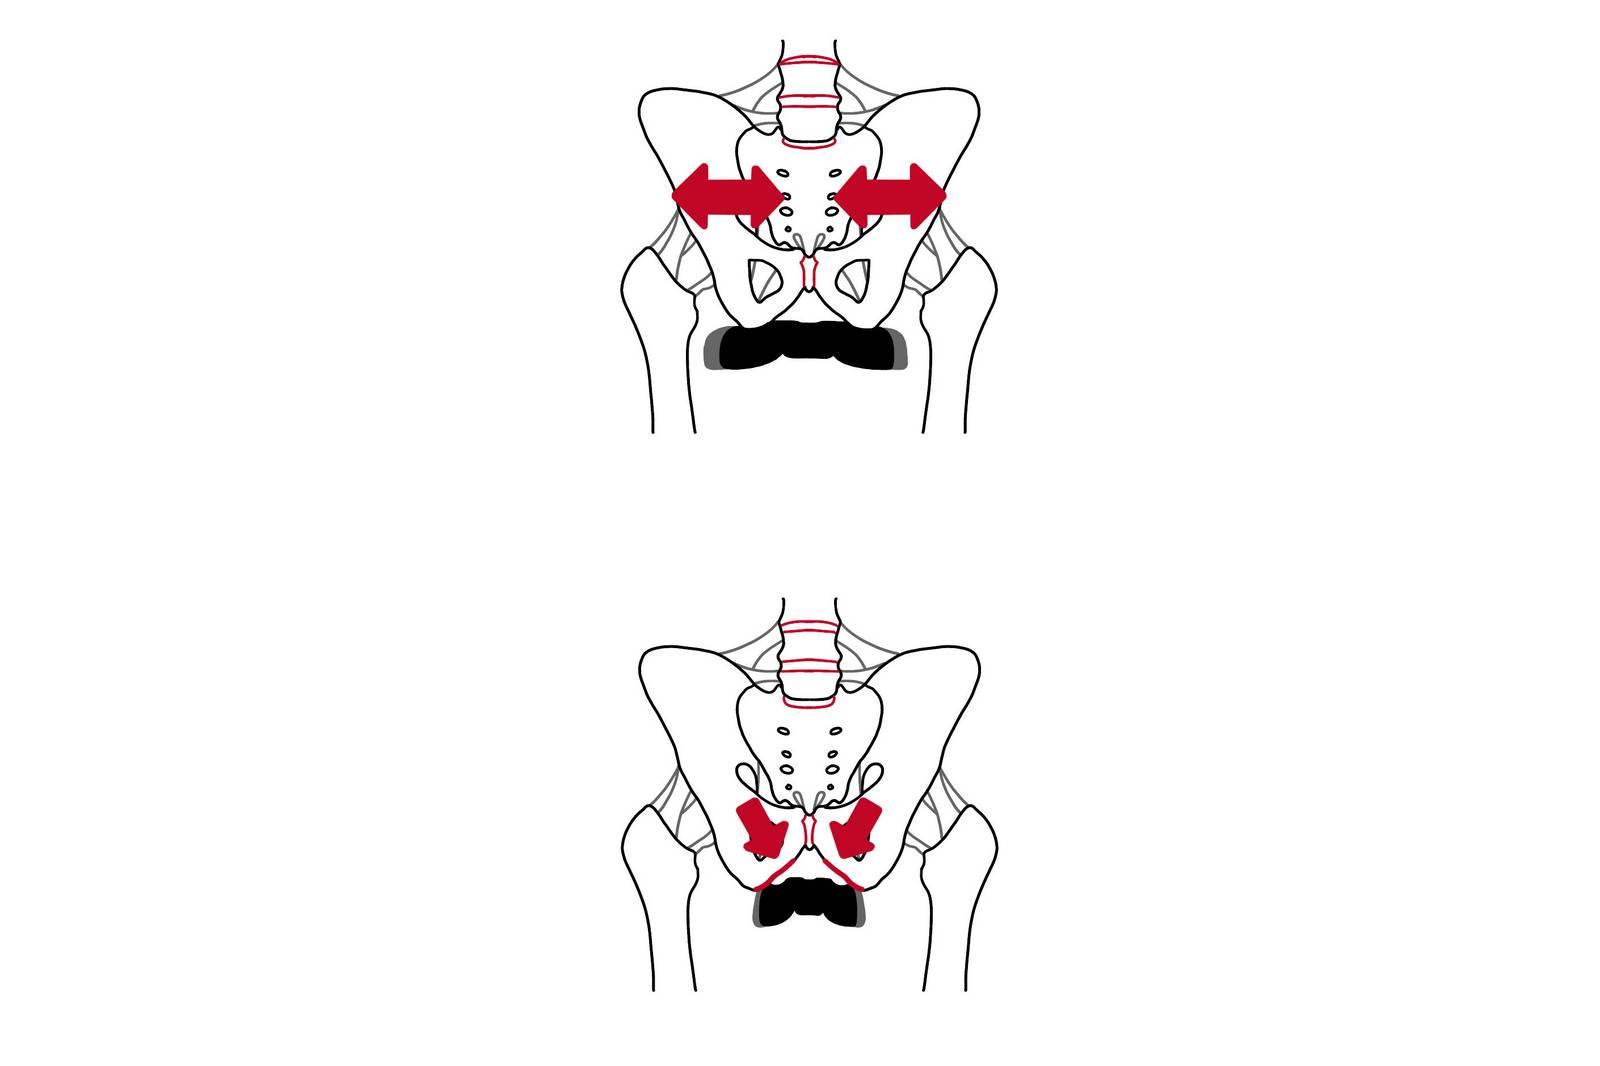 Sitzknochen Abstand Becken